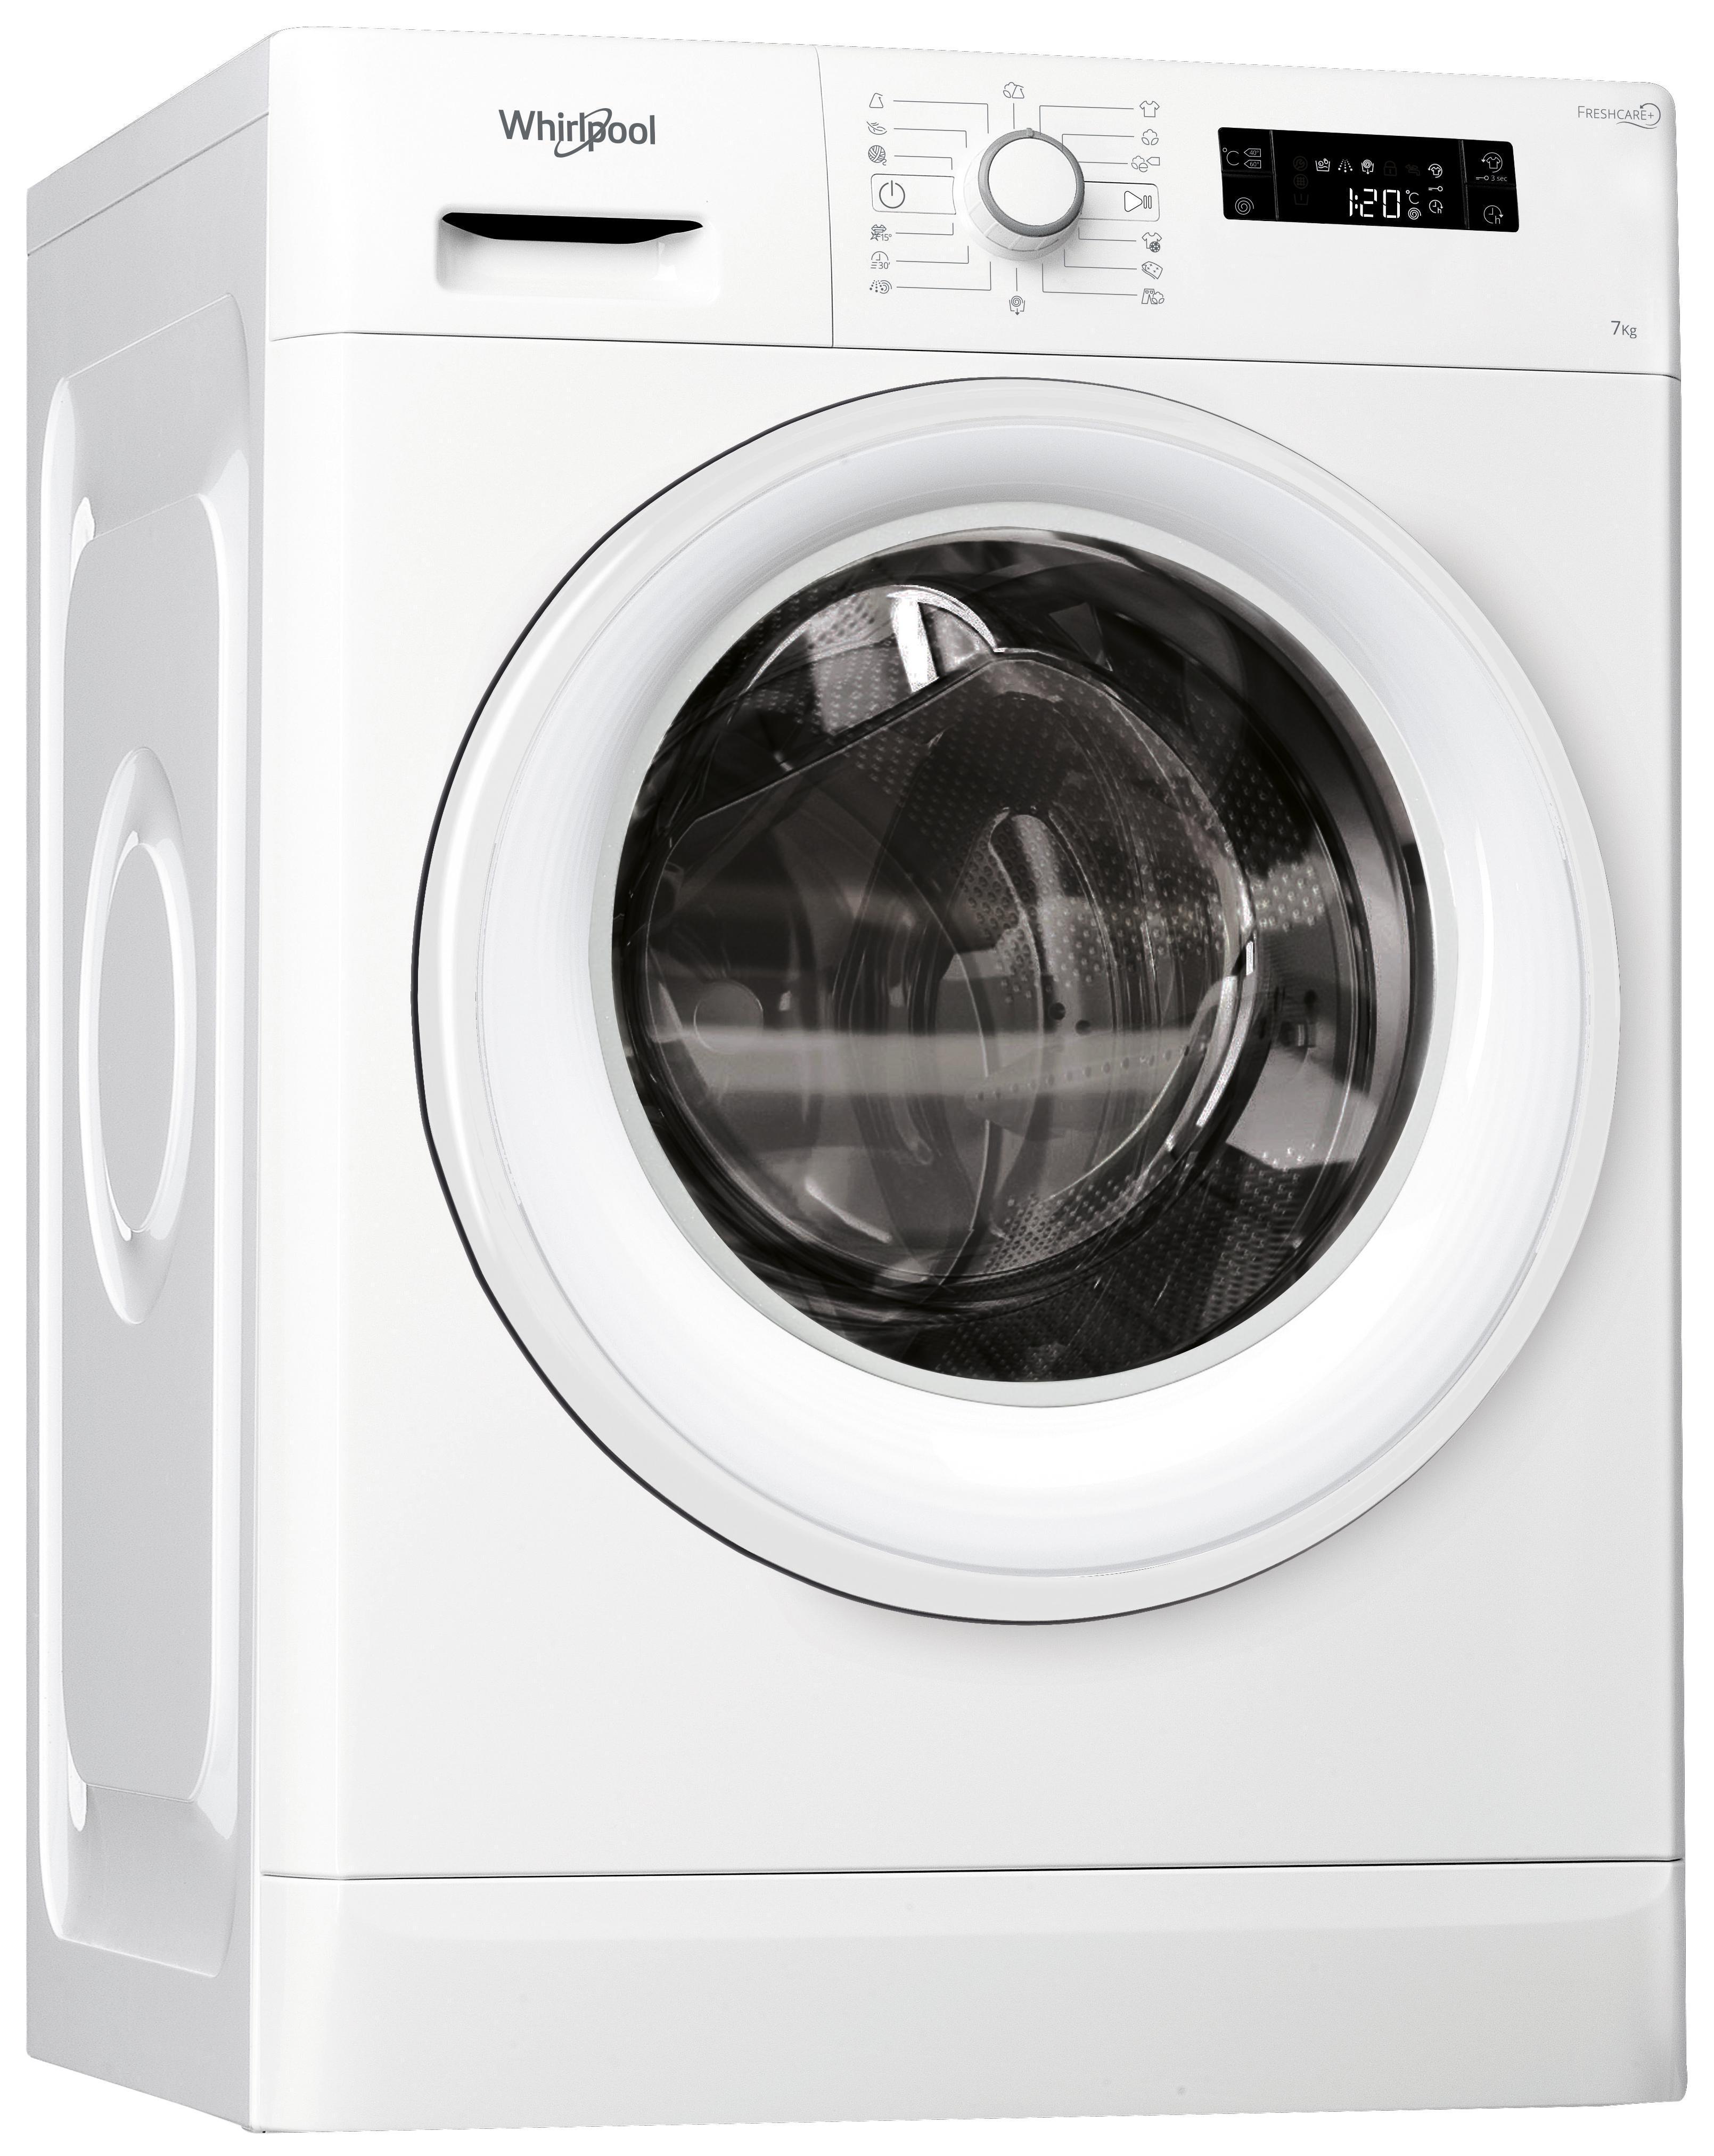 bettdecke waschen gr e waschmaschine motor lattenroste einrichtungsideen schlafzimmer. Black Bedroom Furniture Sets. Home Design Ideas